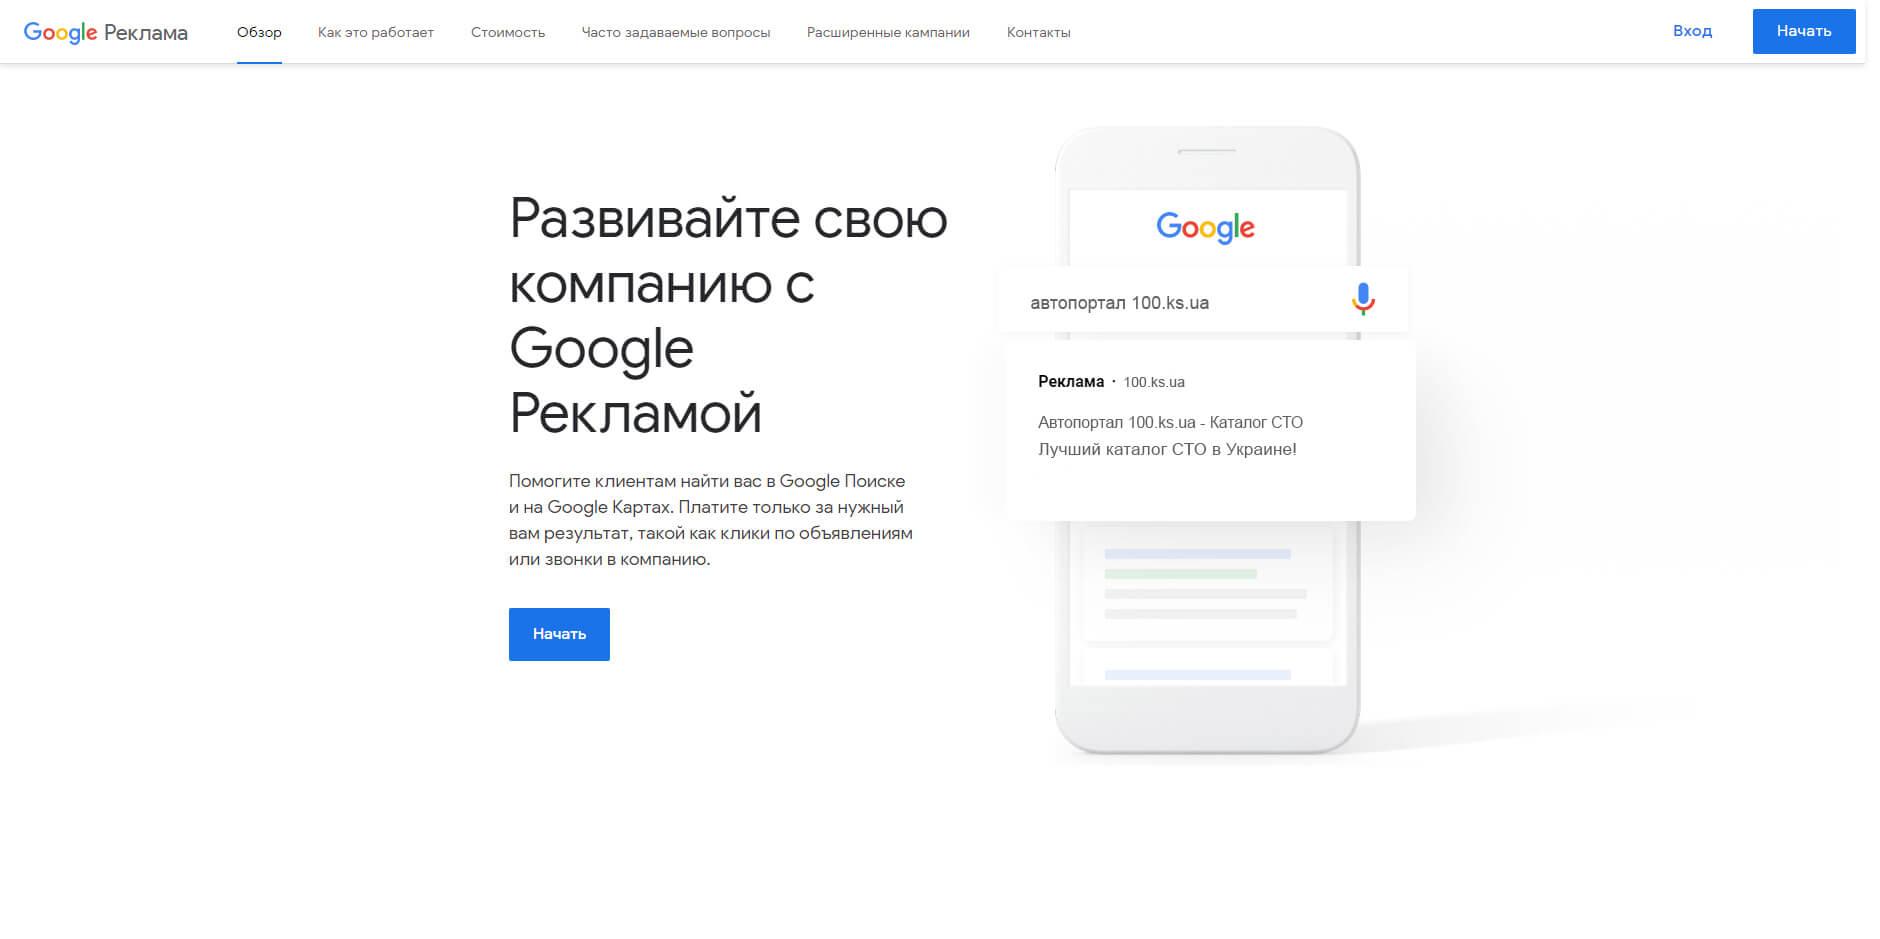 Google Adwords для автосервиса, реклама для автосервиса, самая эффективная реклама автосервиса